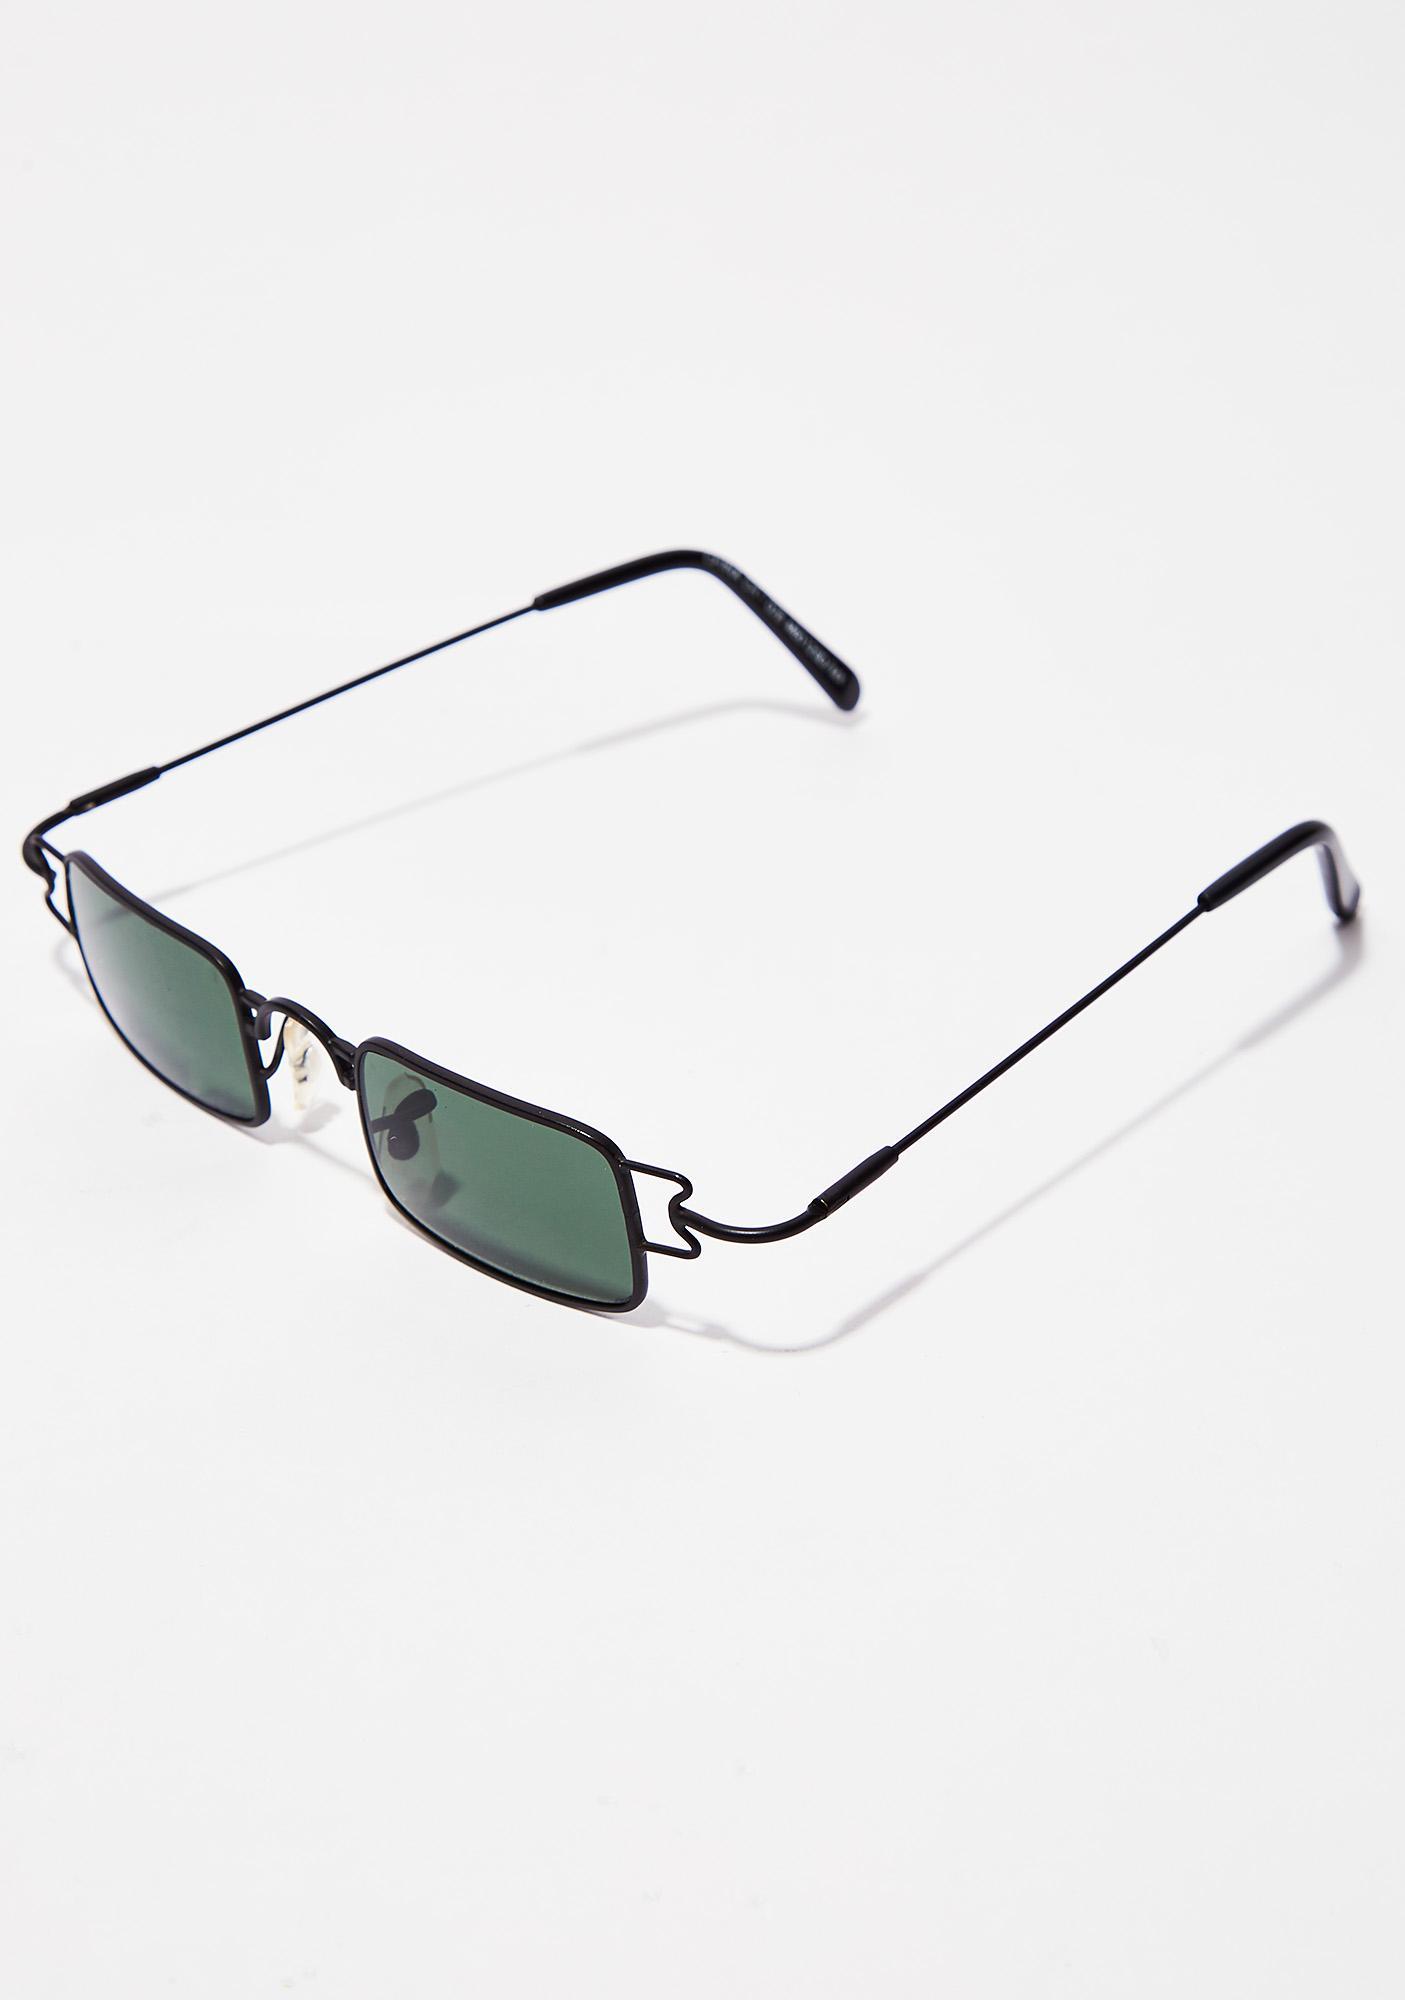 Made U Look Square Sunglasses